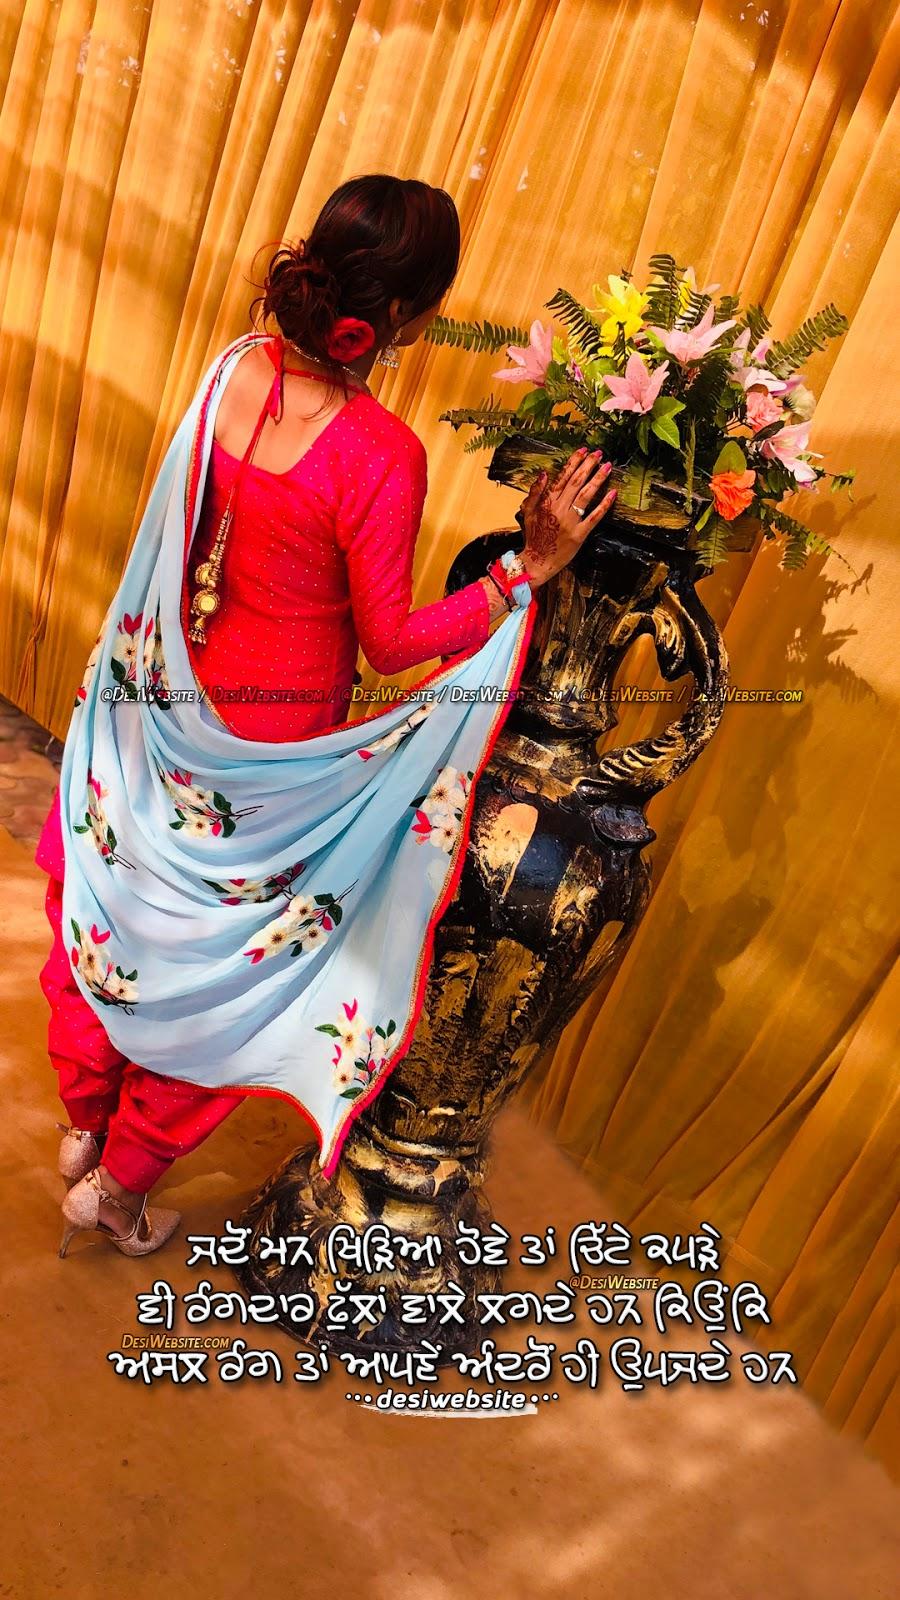 Jado Man Khideya Hove Tan Chitte Kapde Vi Rangdaar Phullan Wale Lagde Ne - sad punjabi shayari